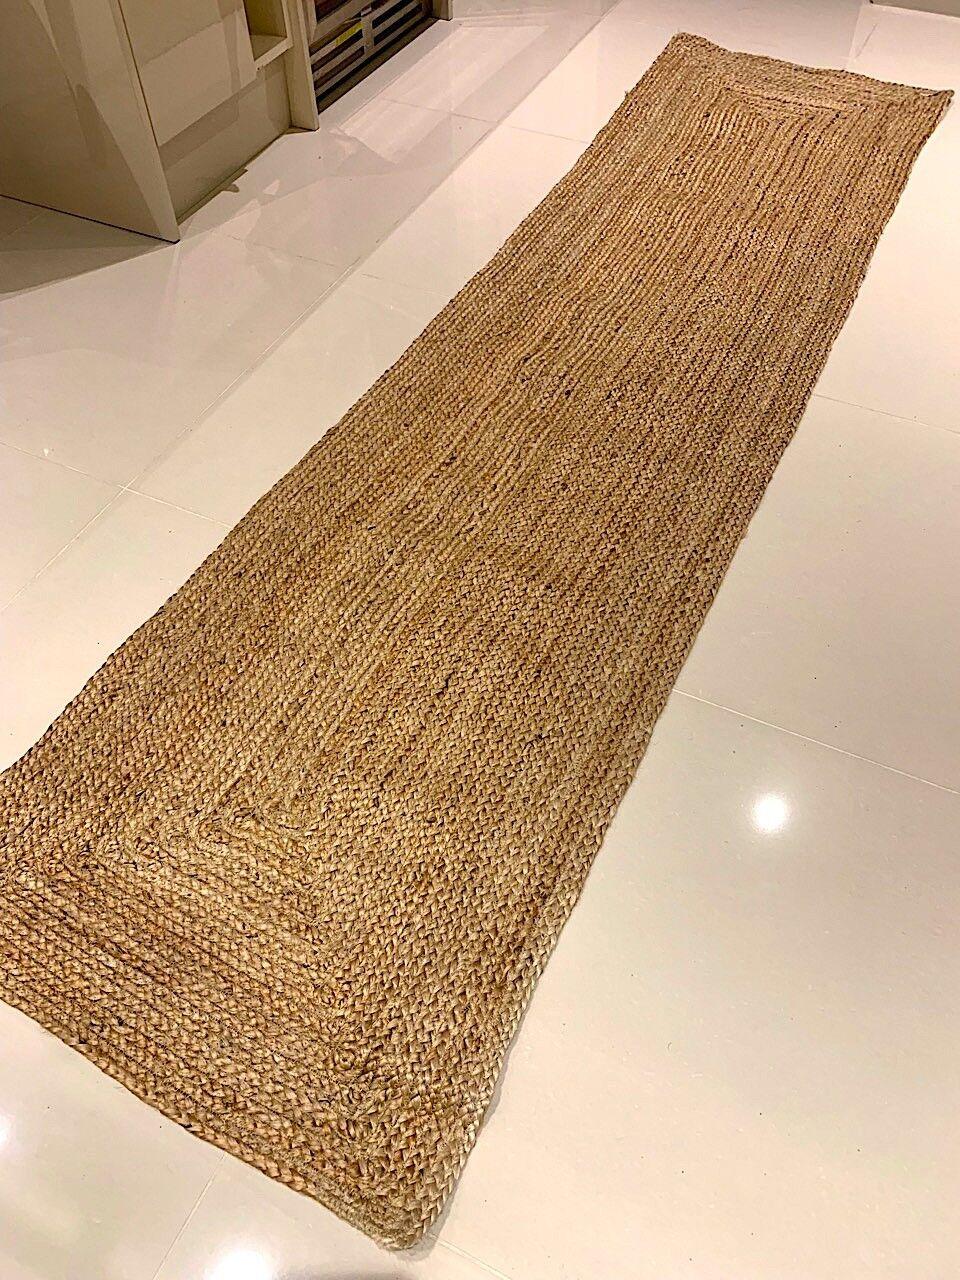 Rugs Carpets Rugs Natural 100 Jute Reversible Eco